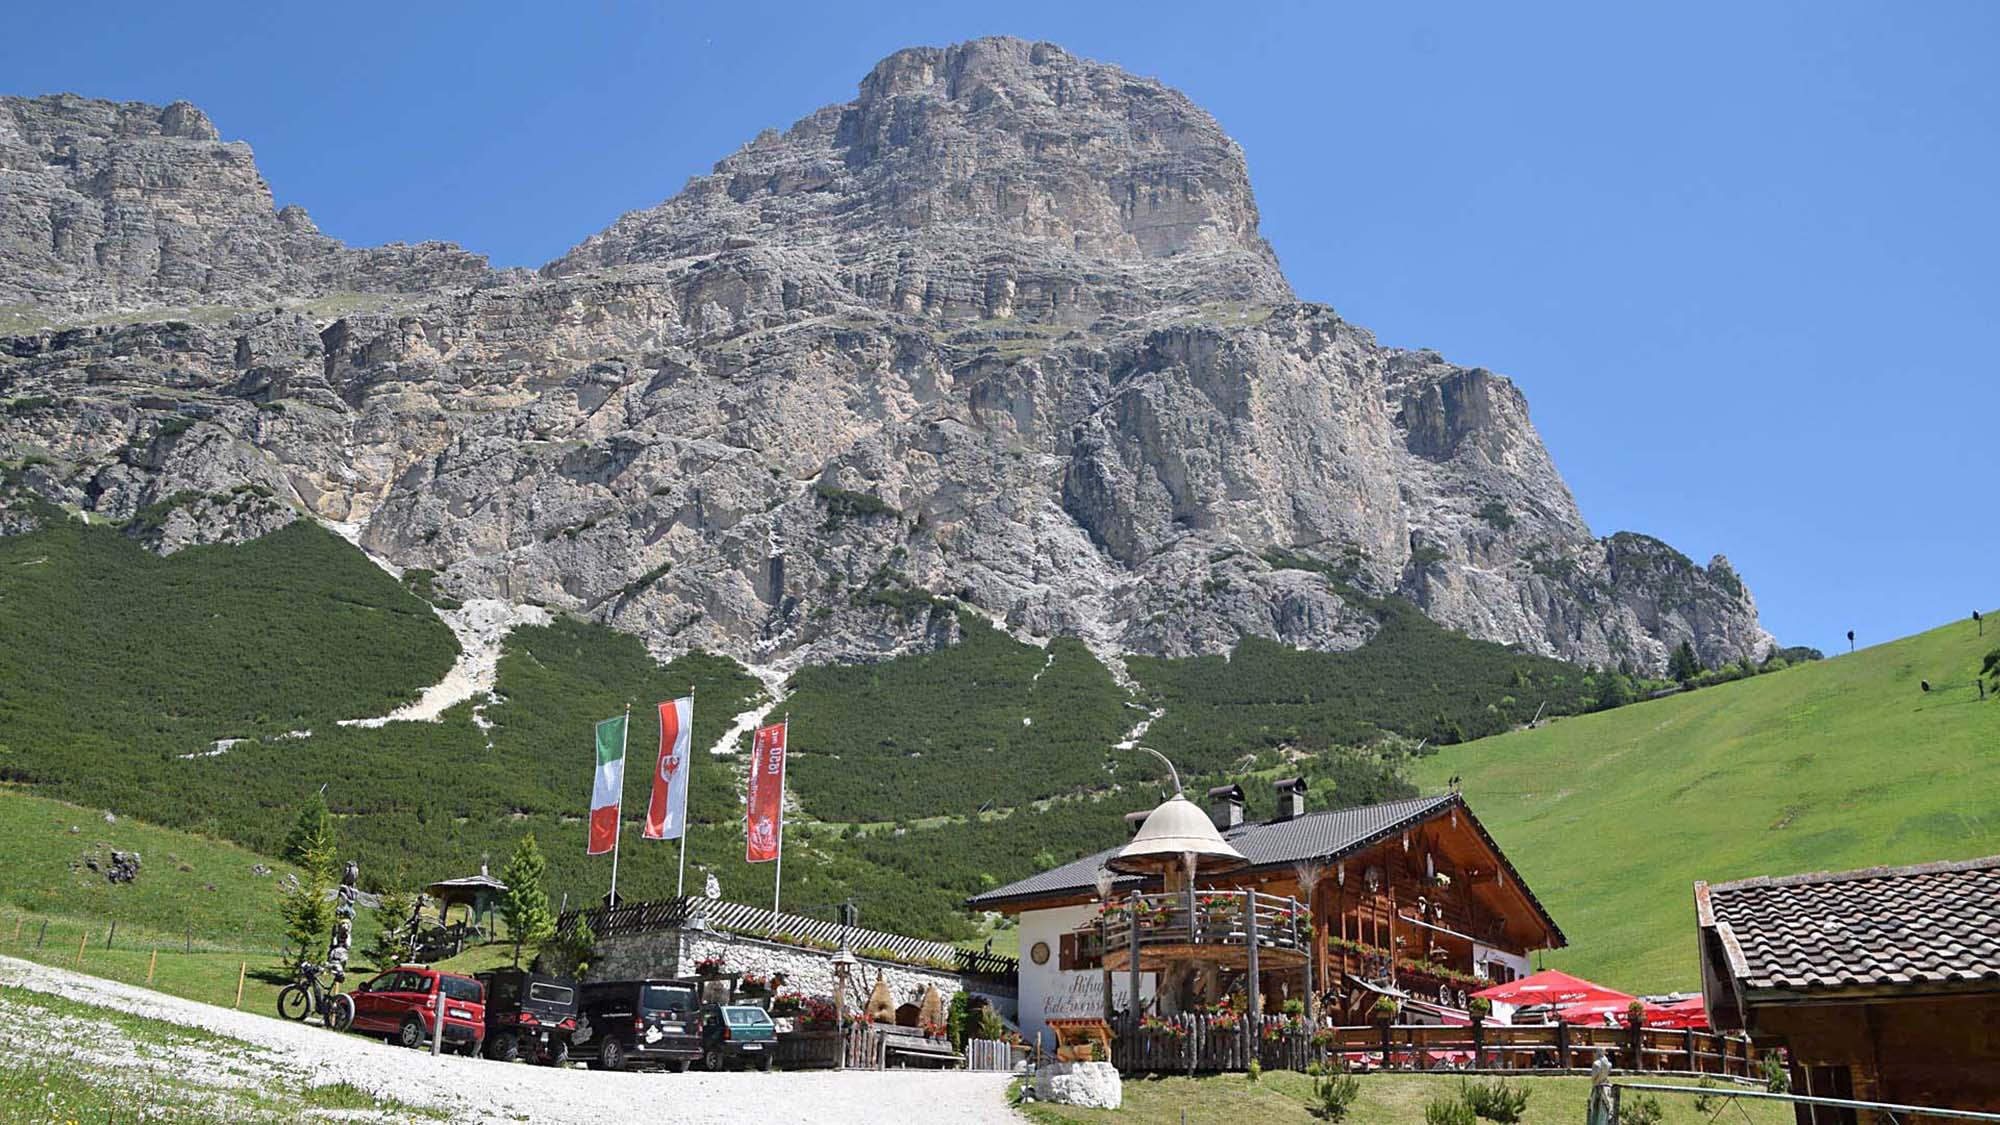 2021-8-20-NO-Franz Hube- Traumtour Dolomiten + 032 edelweisshuette-colpradat